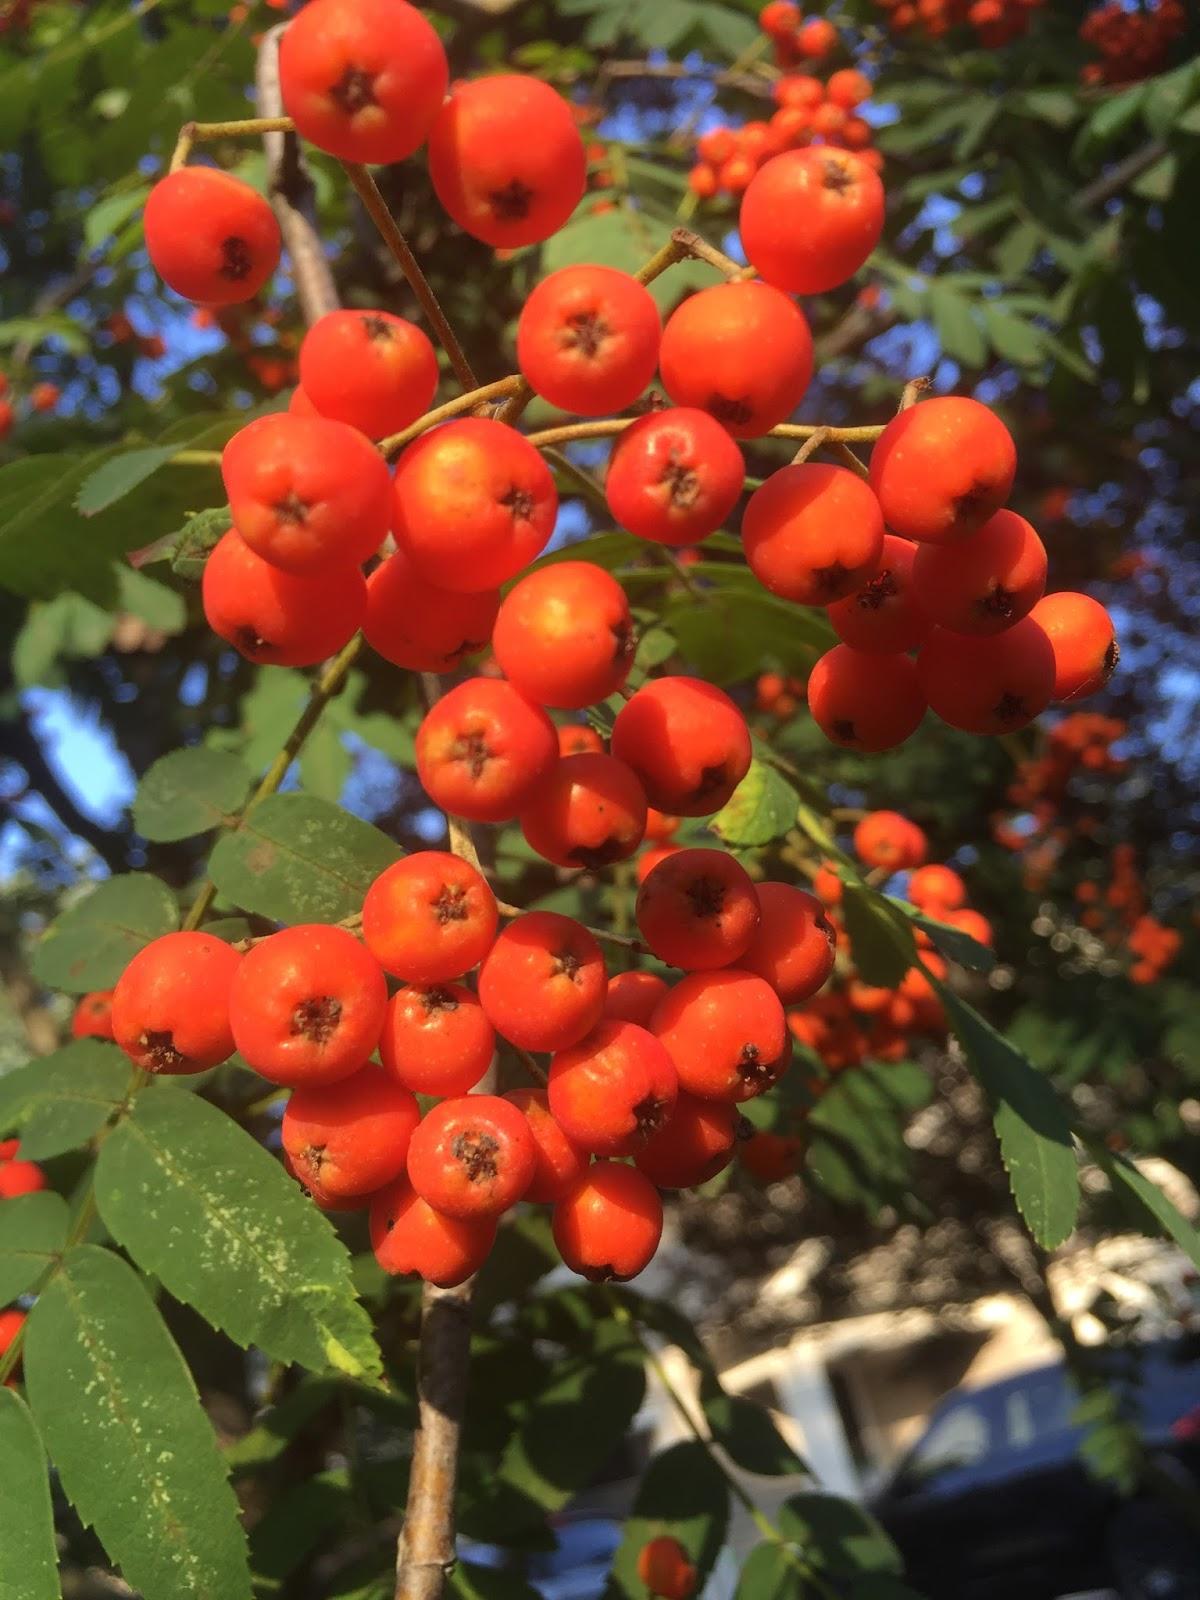 Fall berry blush